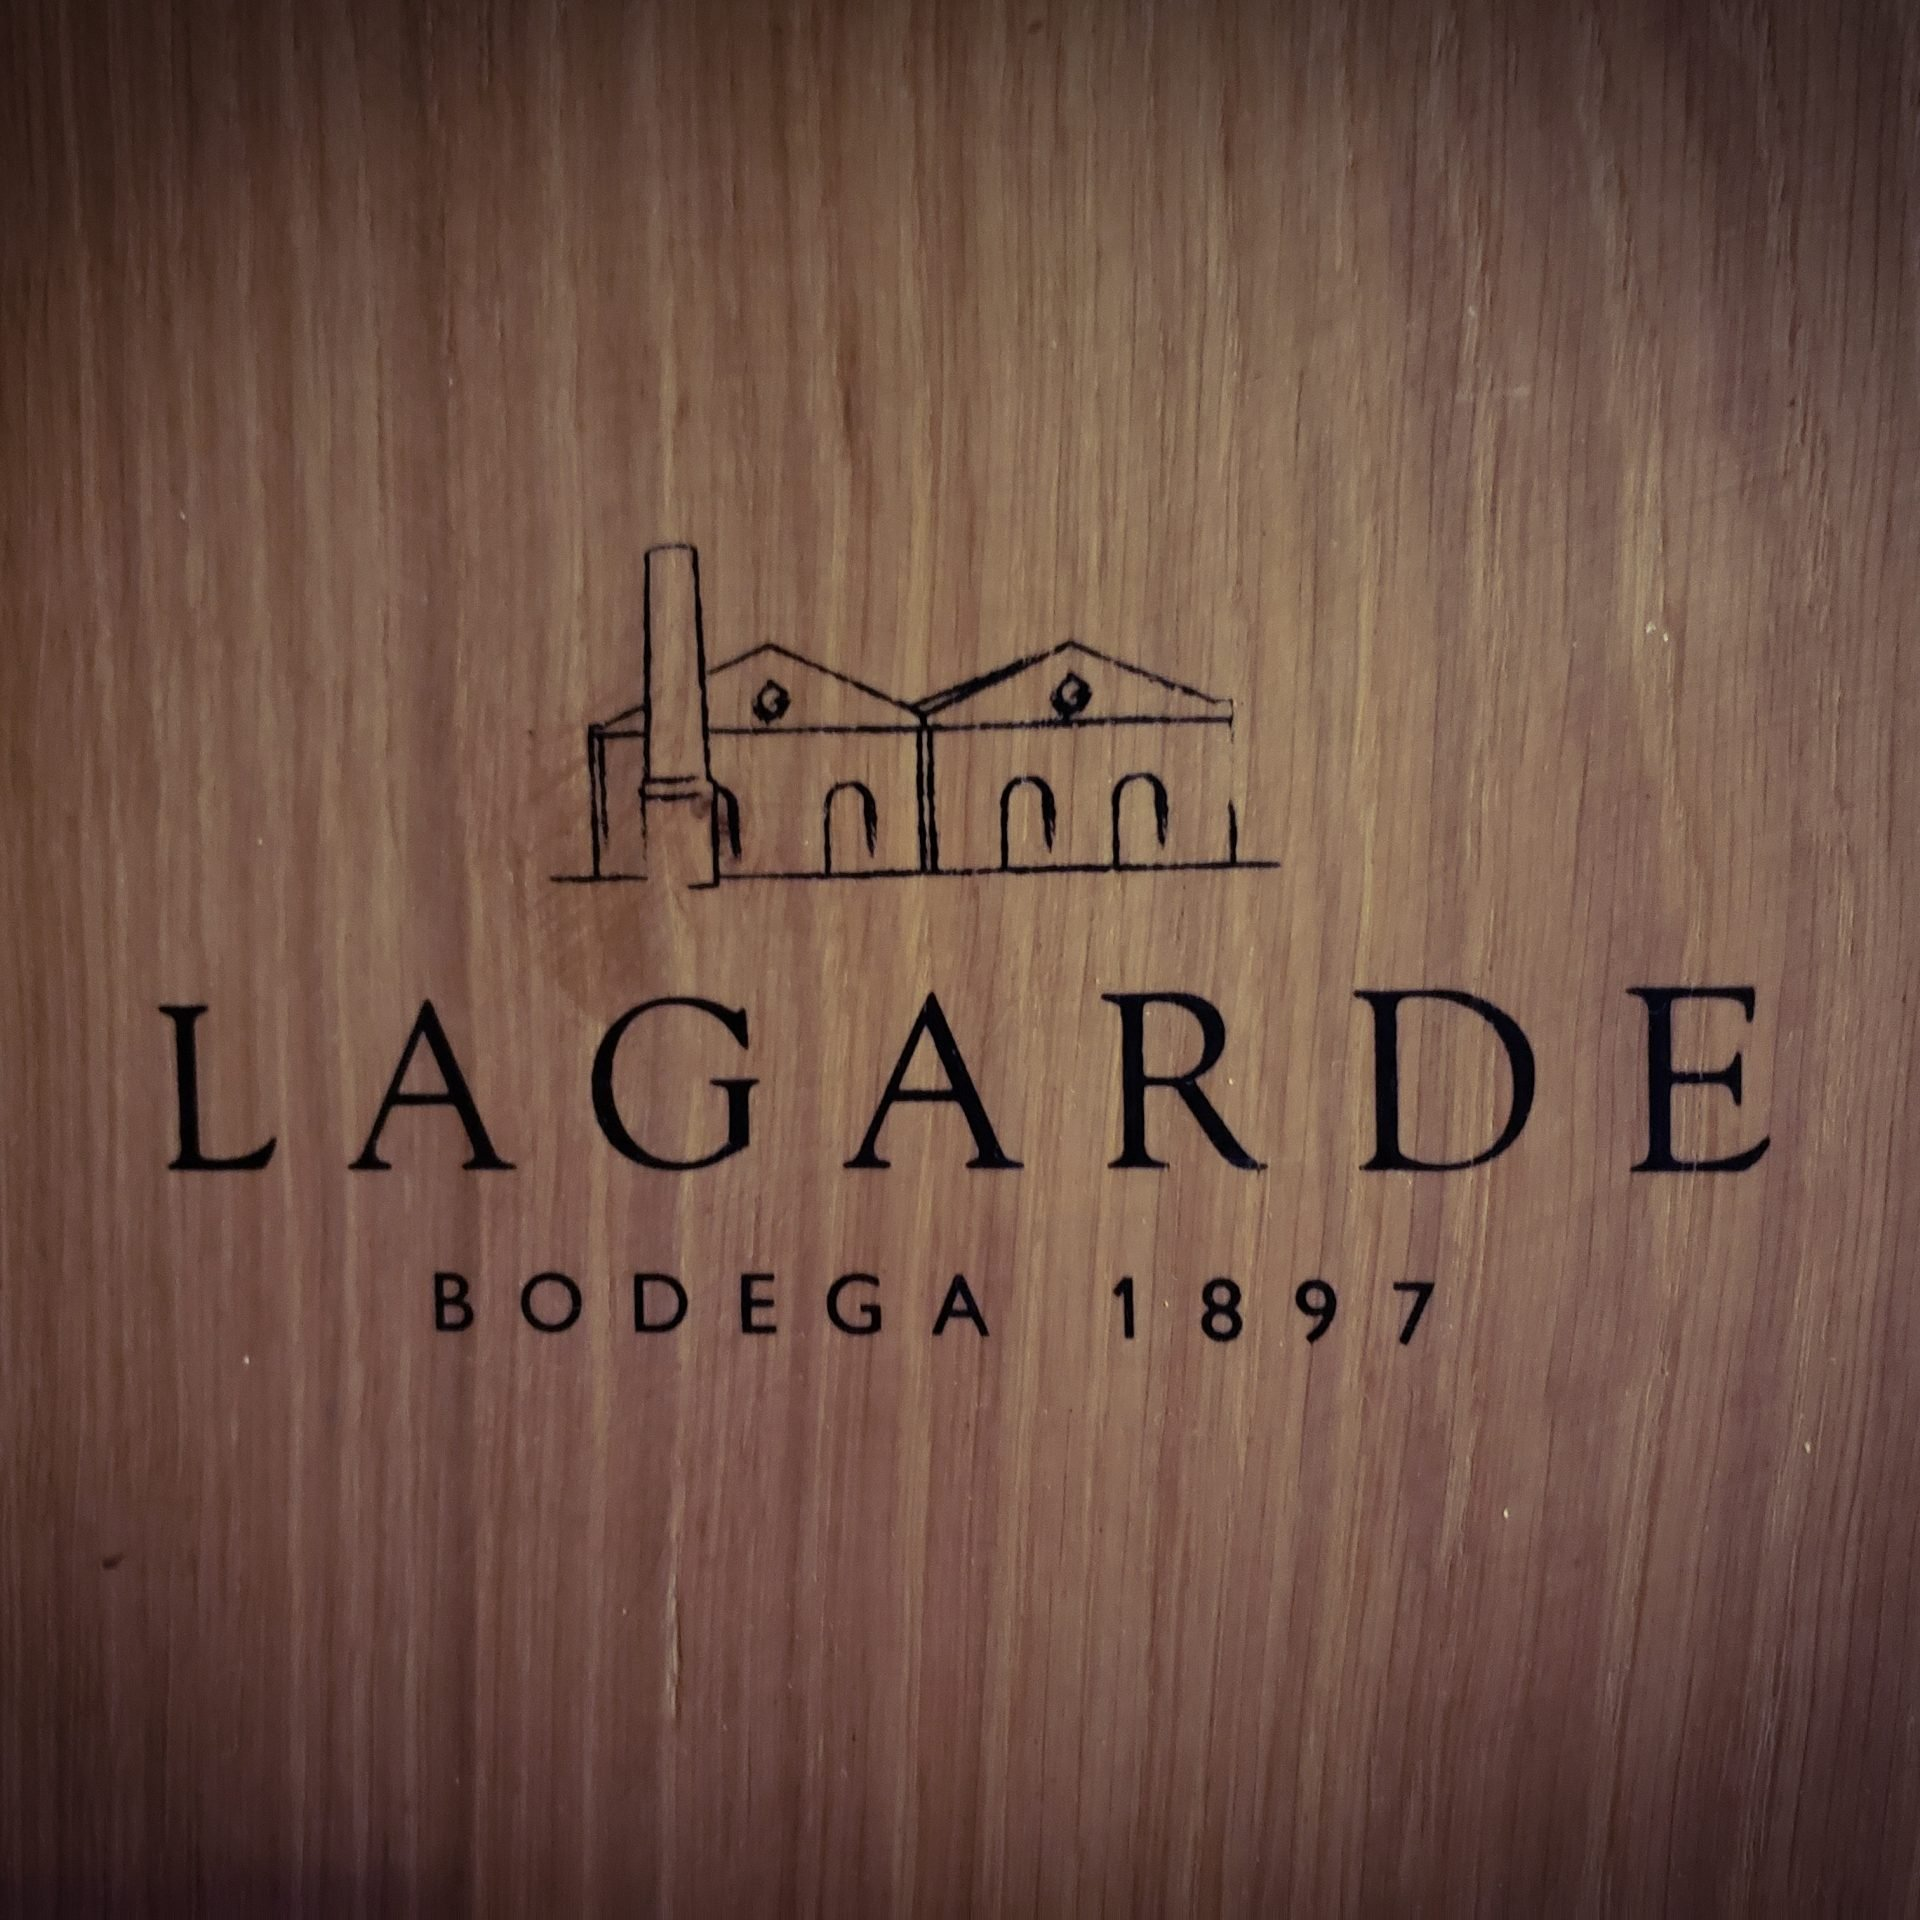 Bodega Lagarde